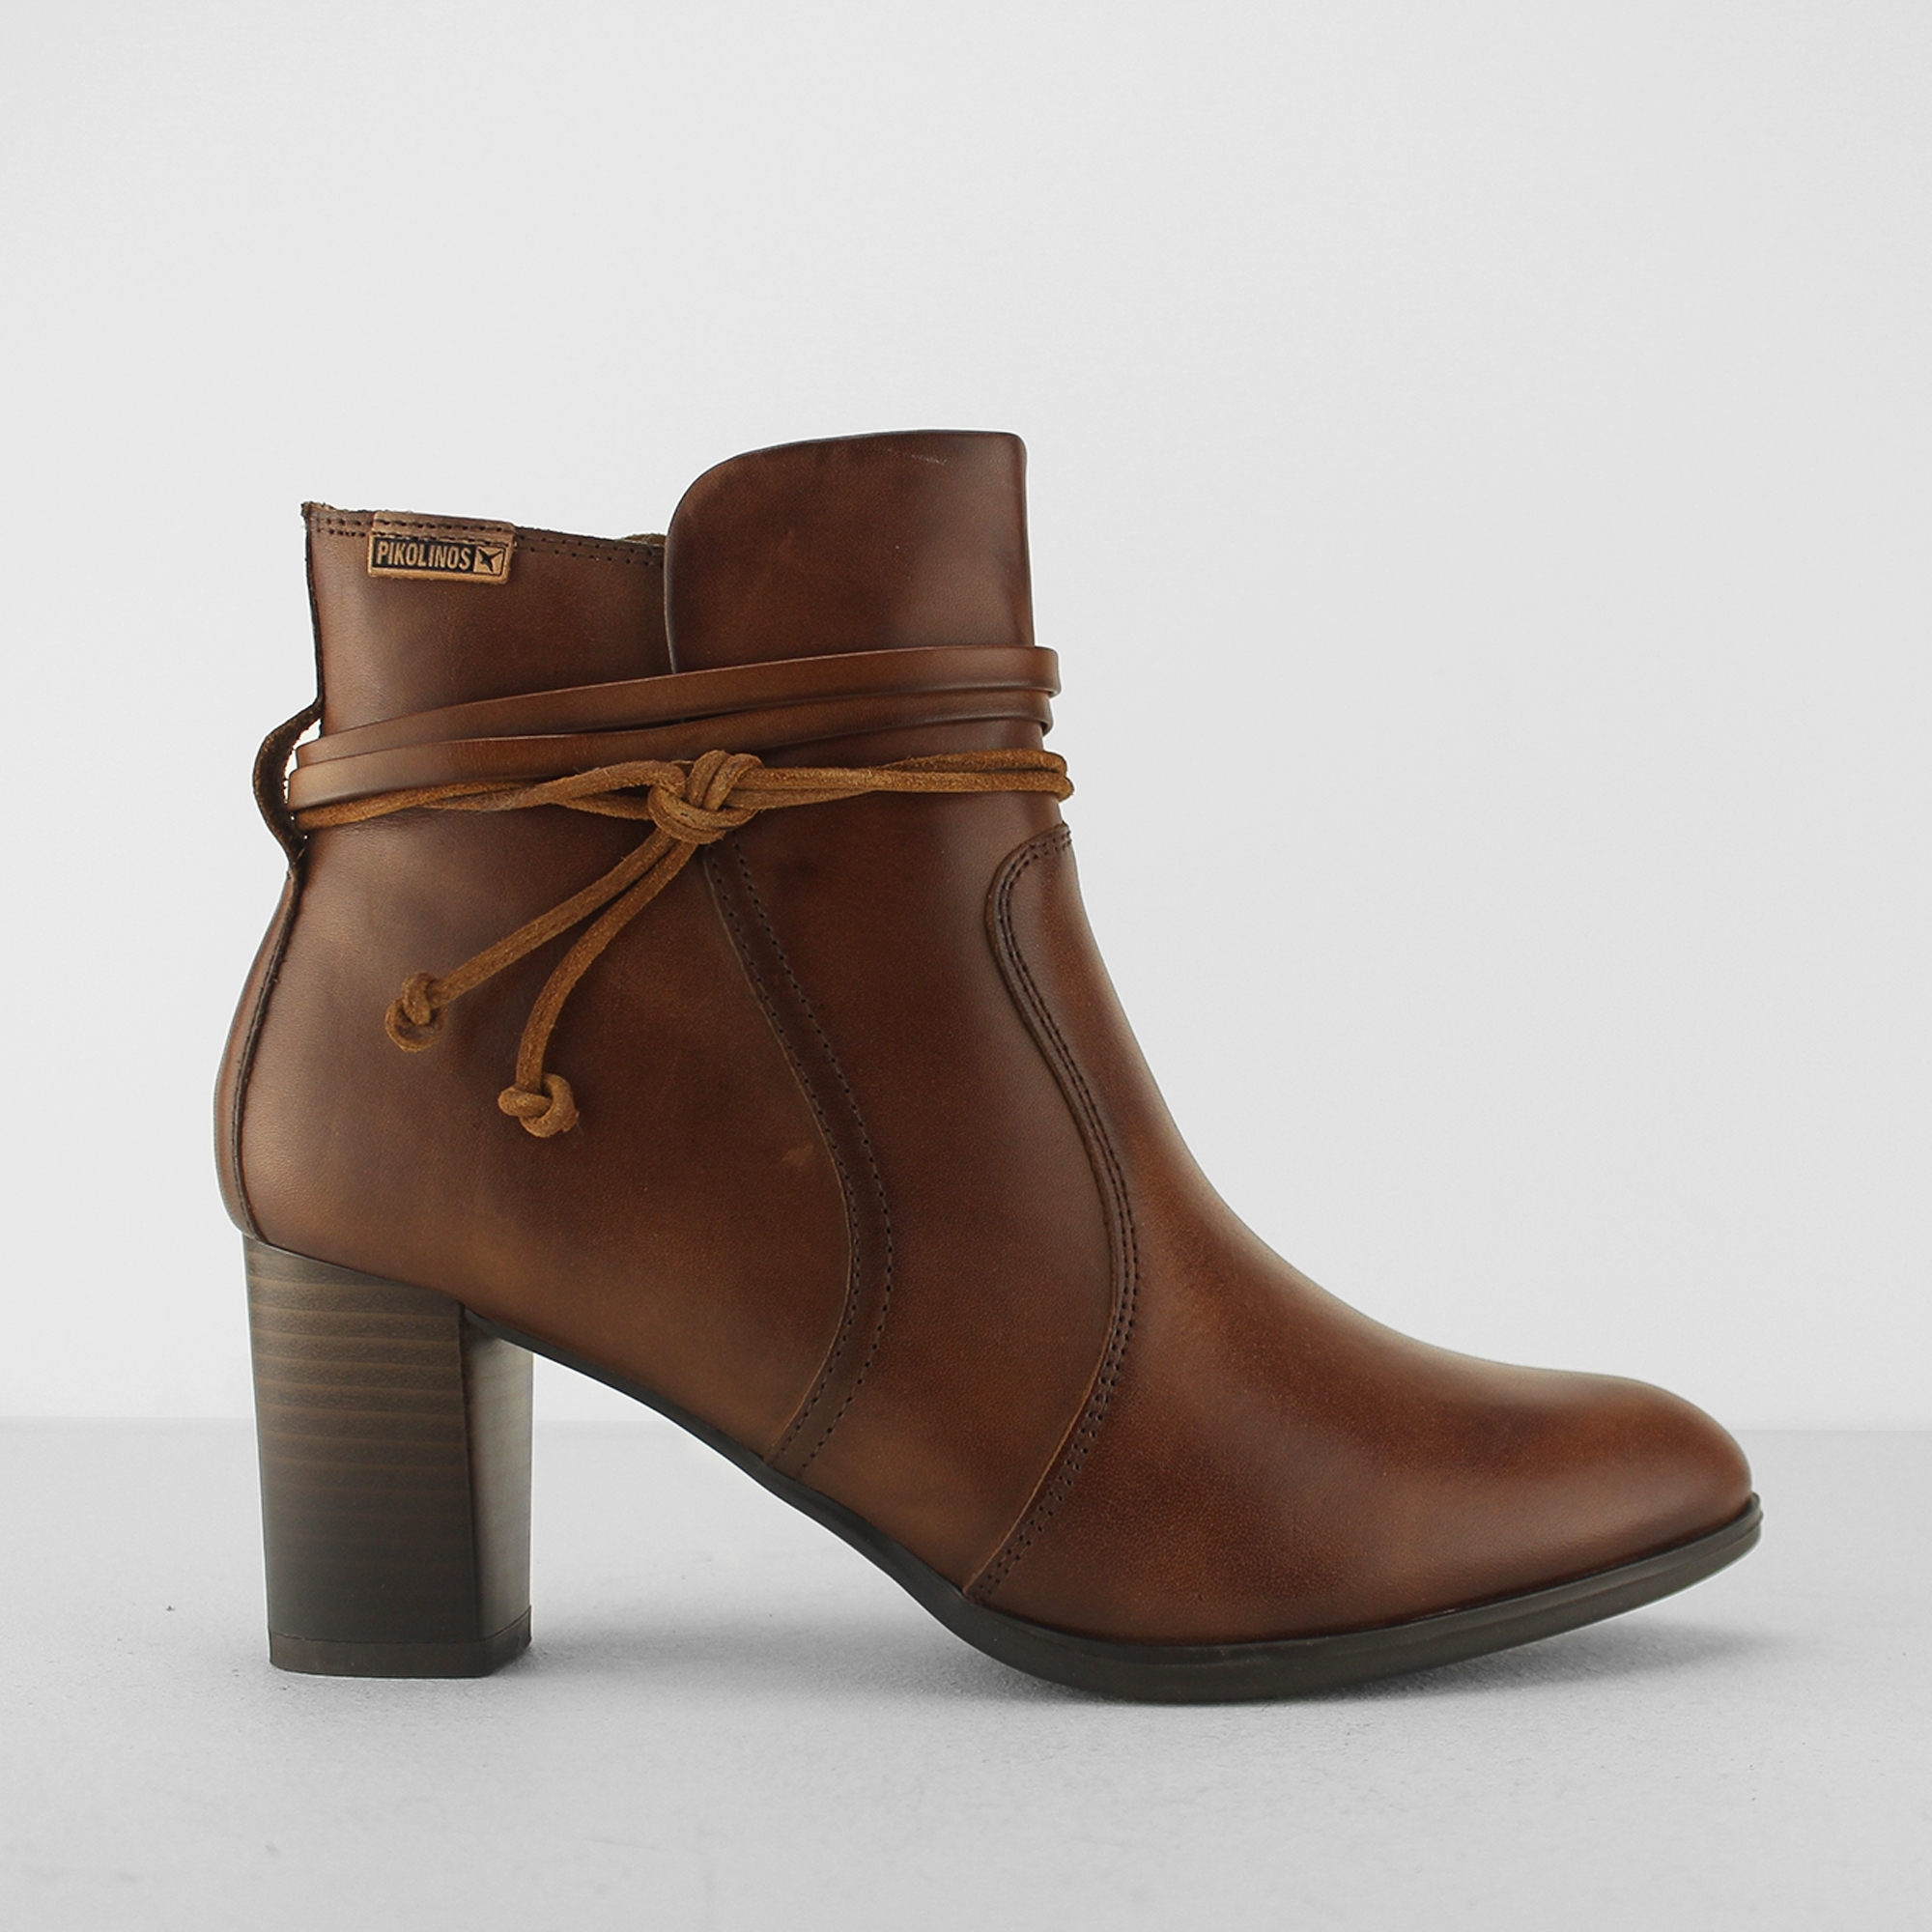 f4aa534263ea5 Pikolinos VIENA Ladies Leather Wedge Heel Zip Up Shoes Tan | Shuperb